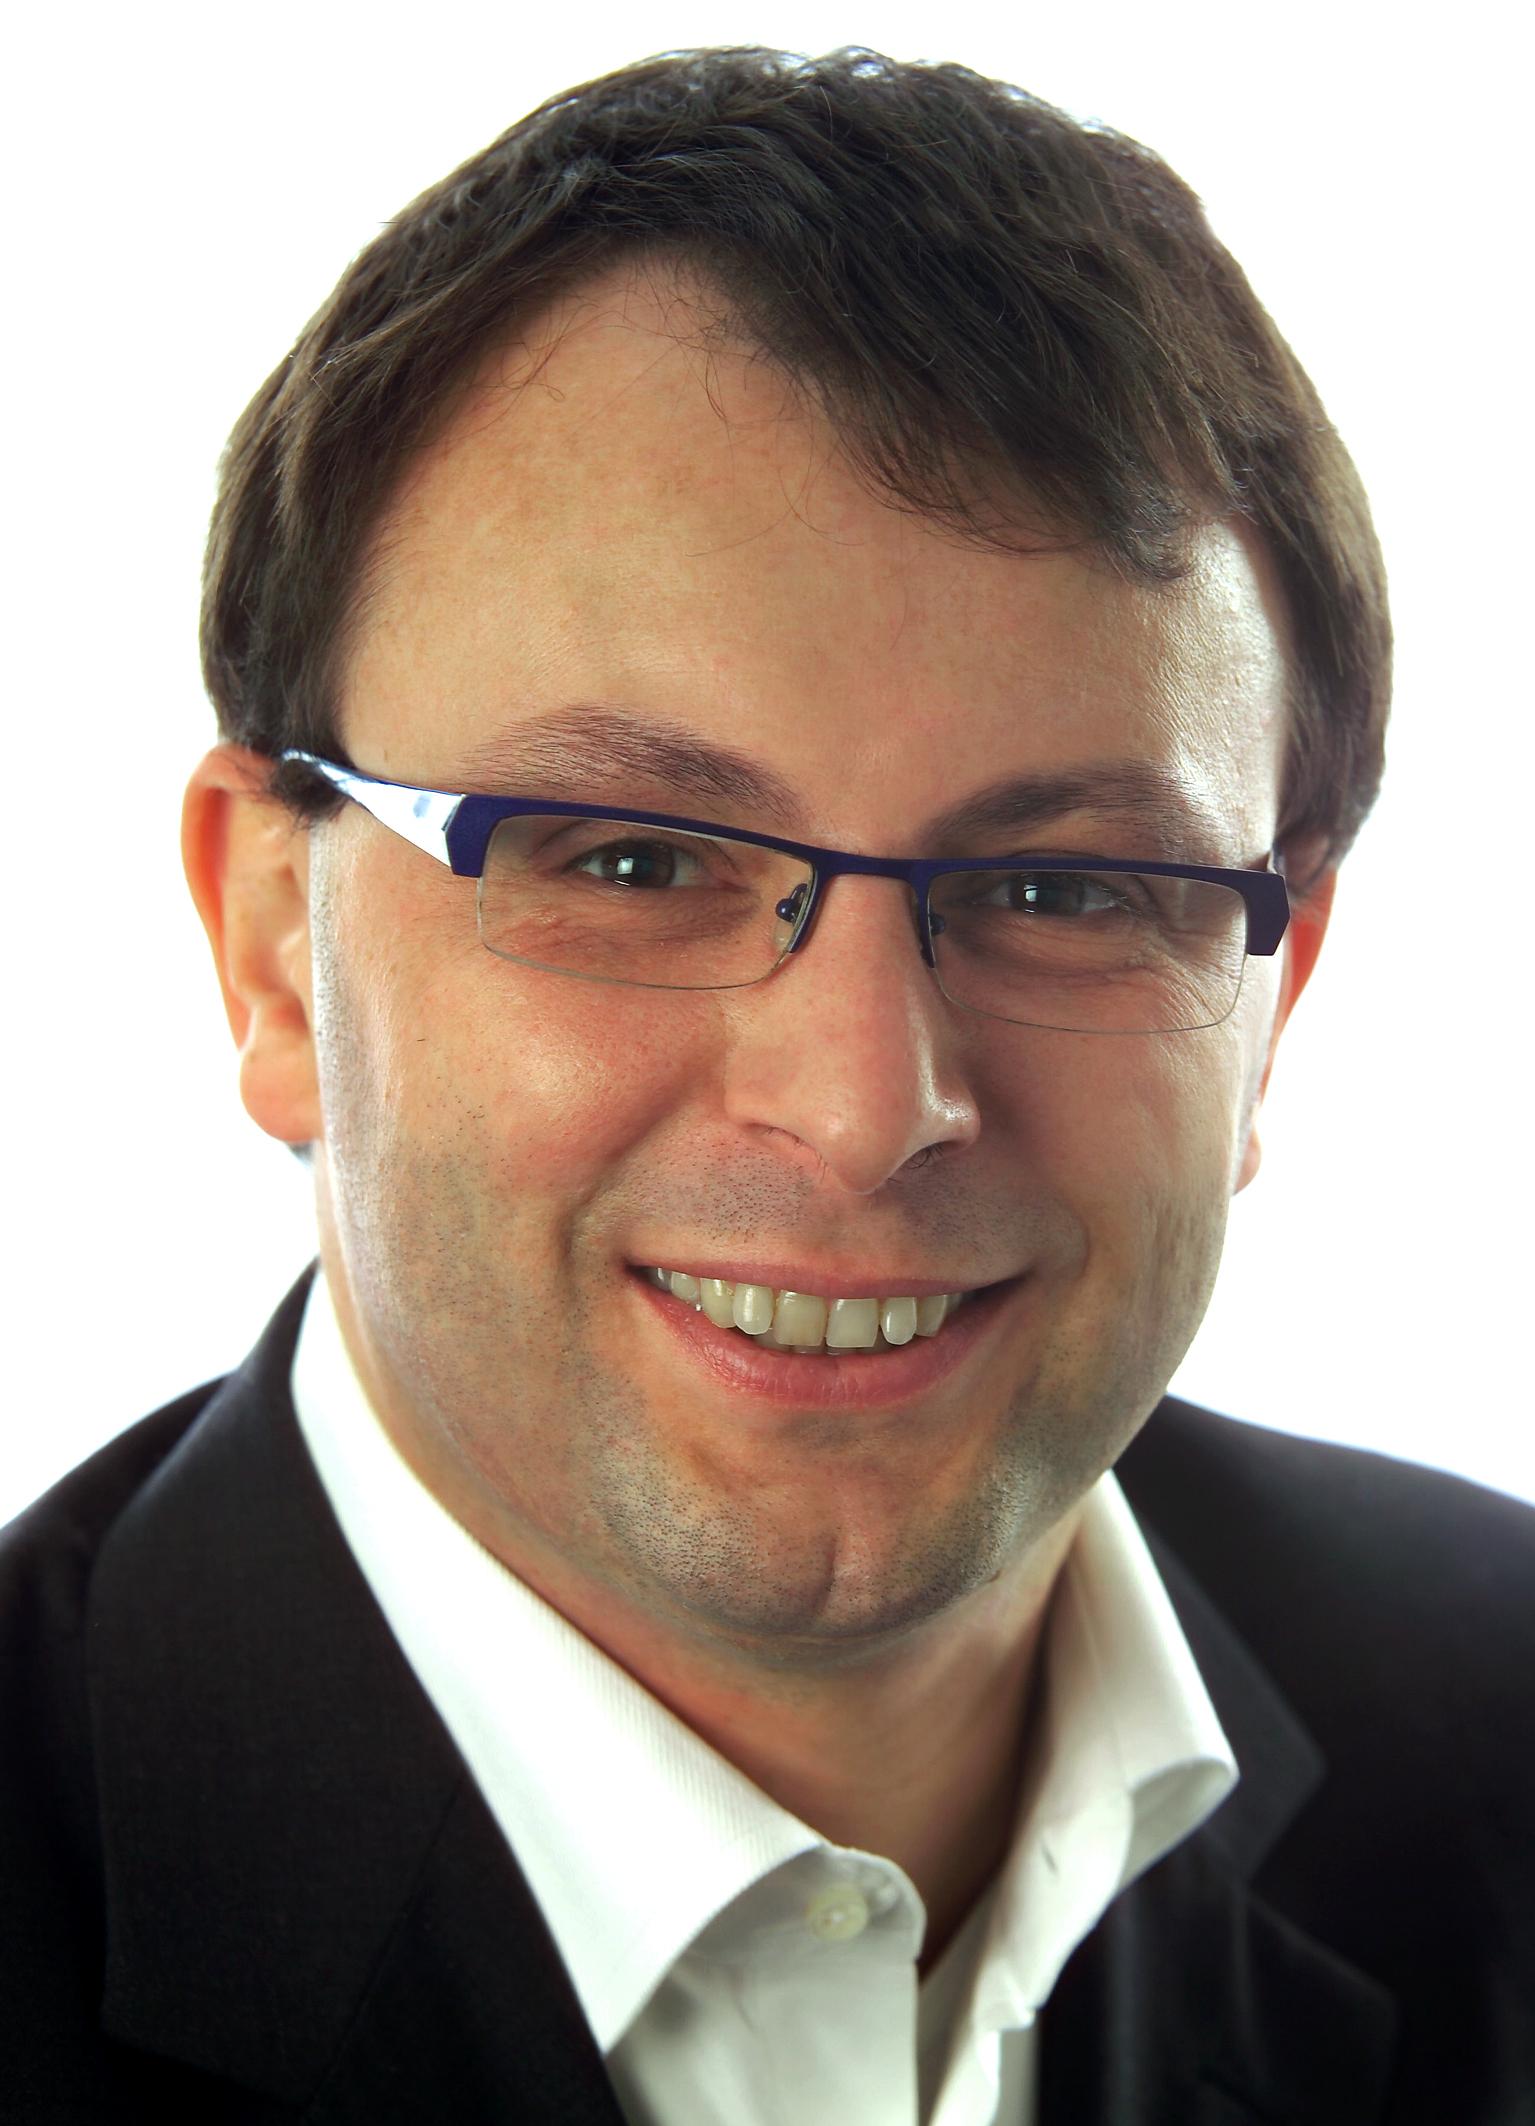 Alessandro Prandi